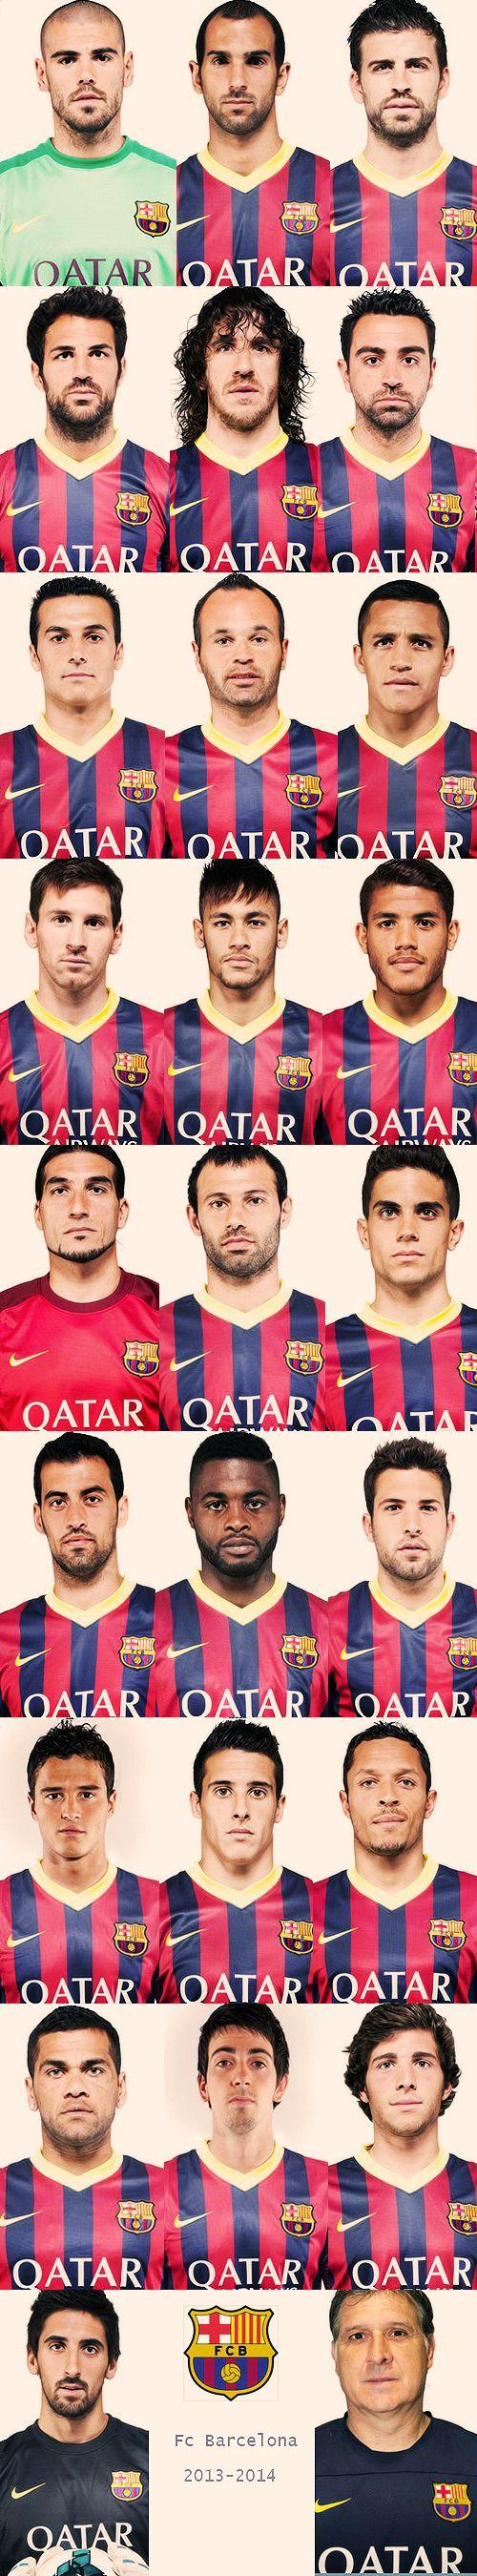 Barca team 2013/14 #fcbarcelona #barca literally best soccer line-up imaginable